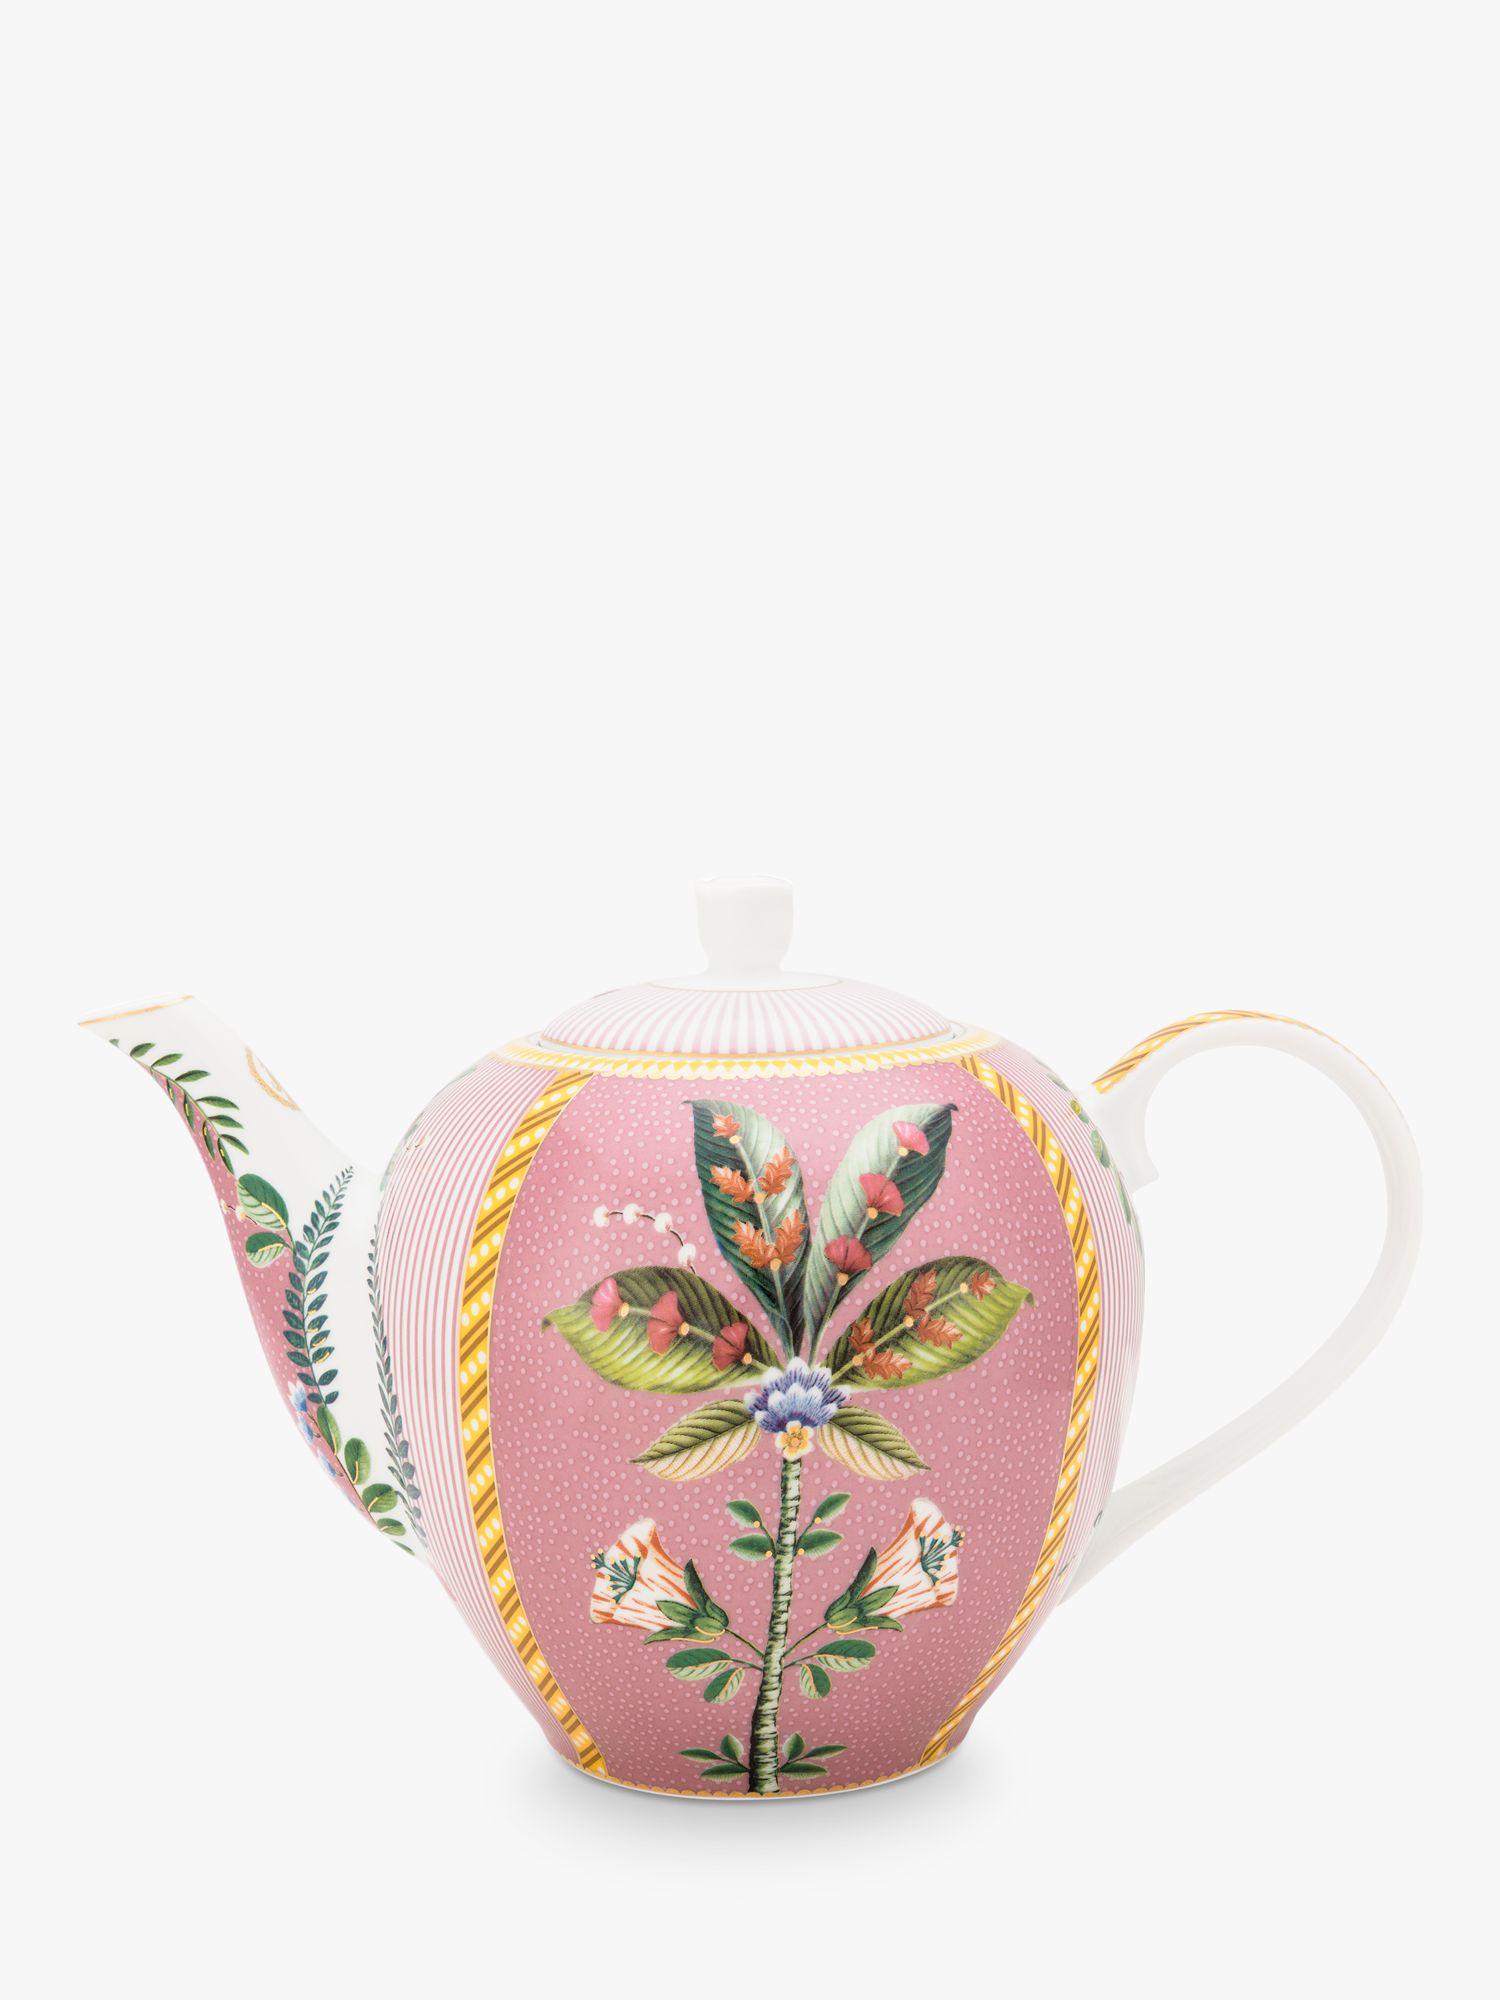 PiP Studio PiP Studio La Majorelle Large Teapot, 1.6L, Pink